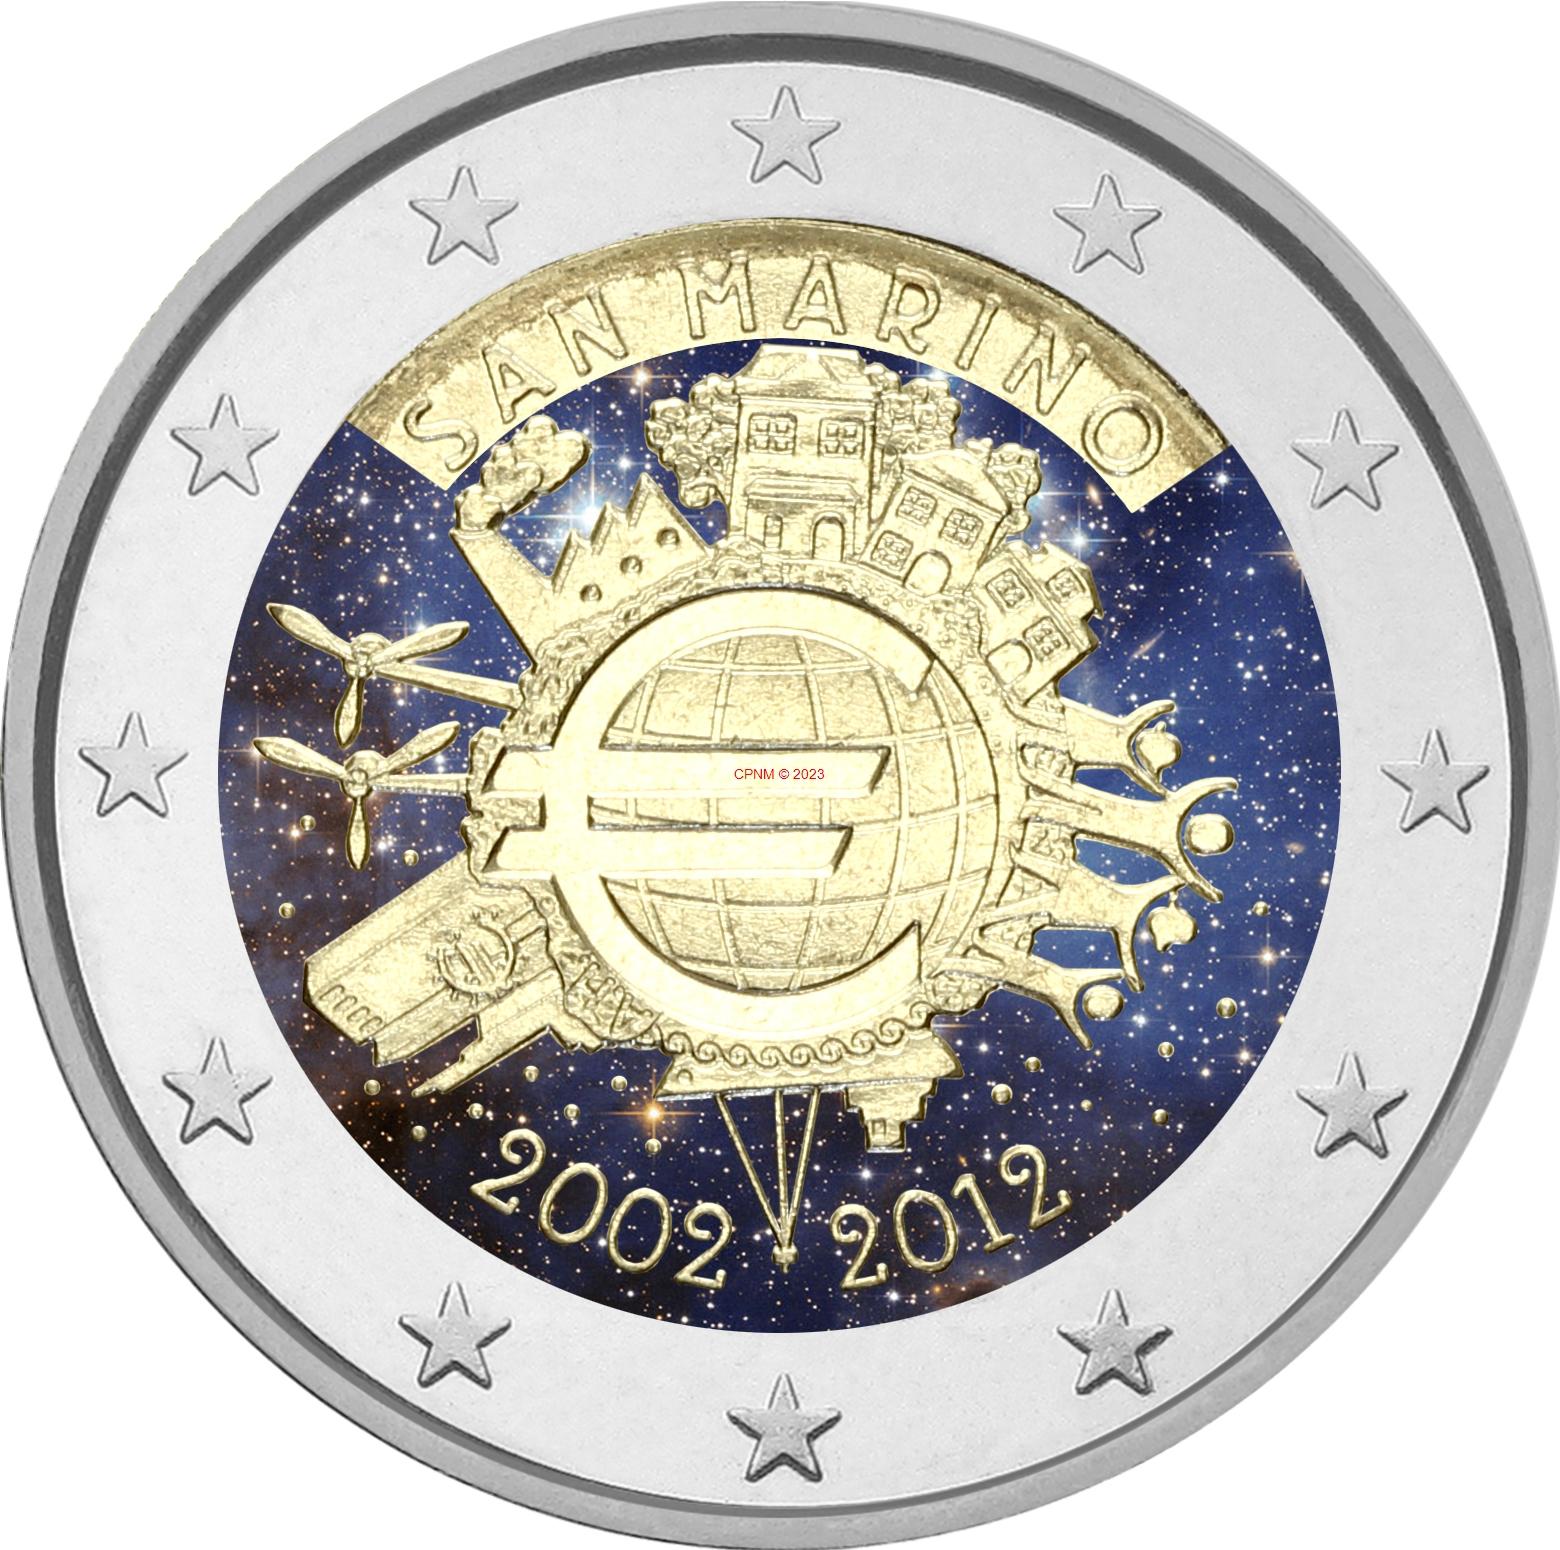 Euros 2 euros comm moratives page 54 - Comptoir numismatique monaco ...